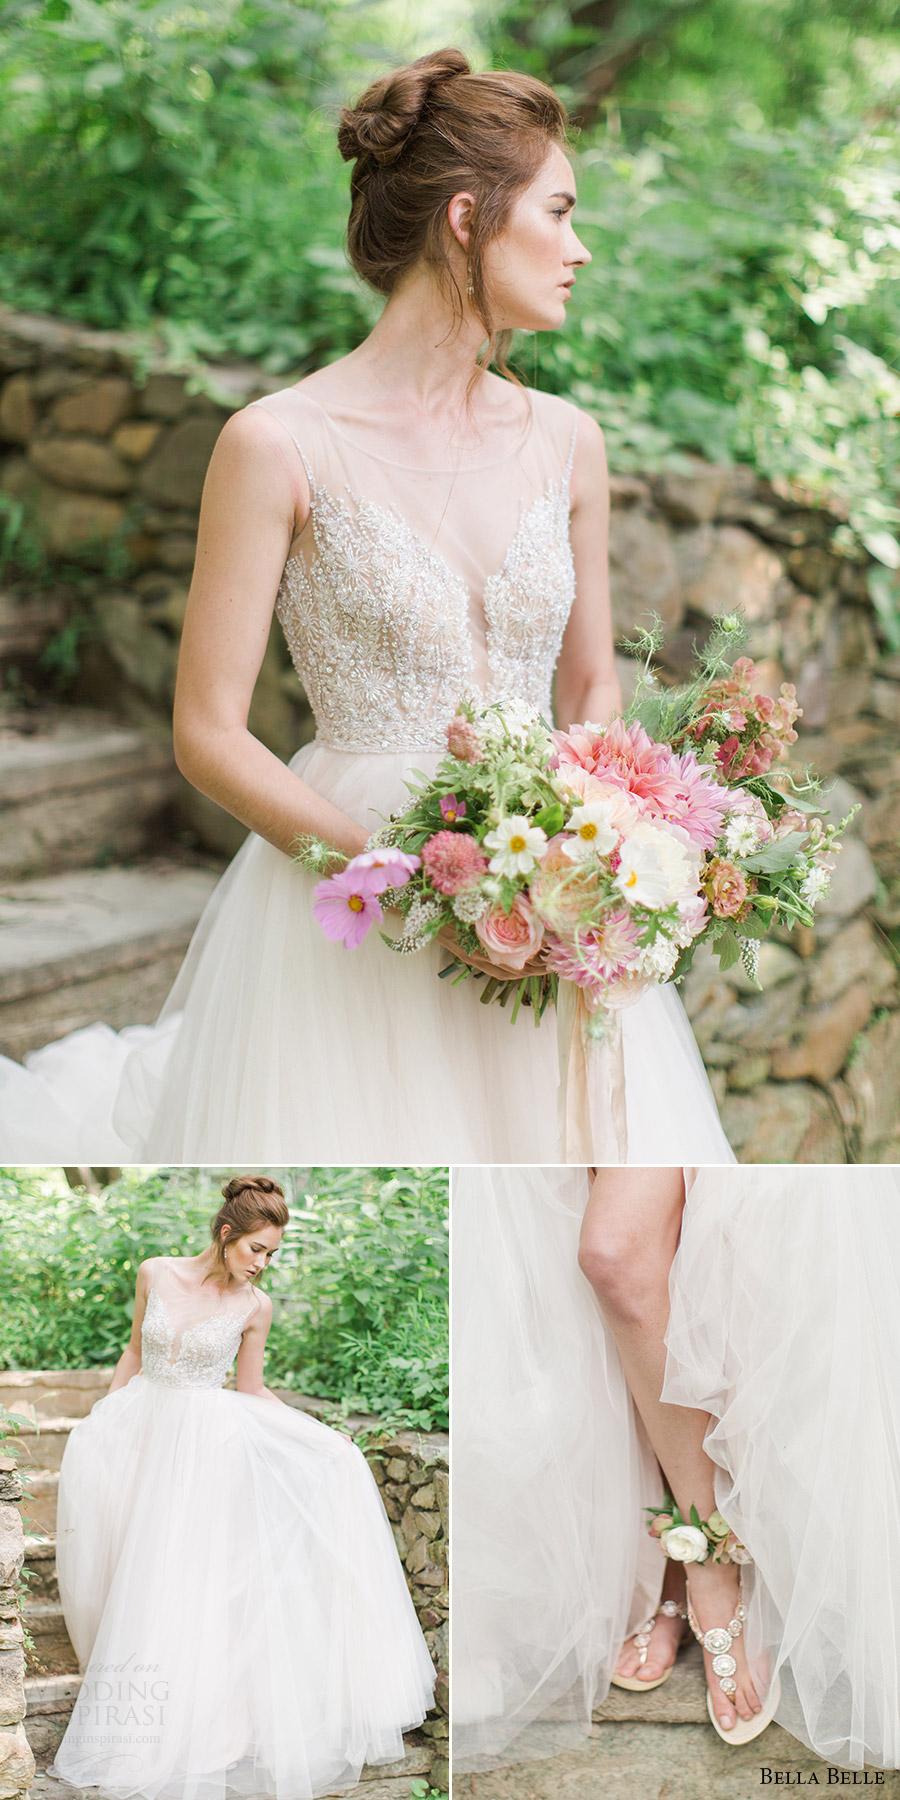 bella belle bridal shoes 2016 myra rhinestone wedding sandals destination weddings watters gown